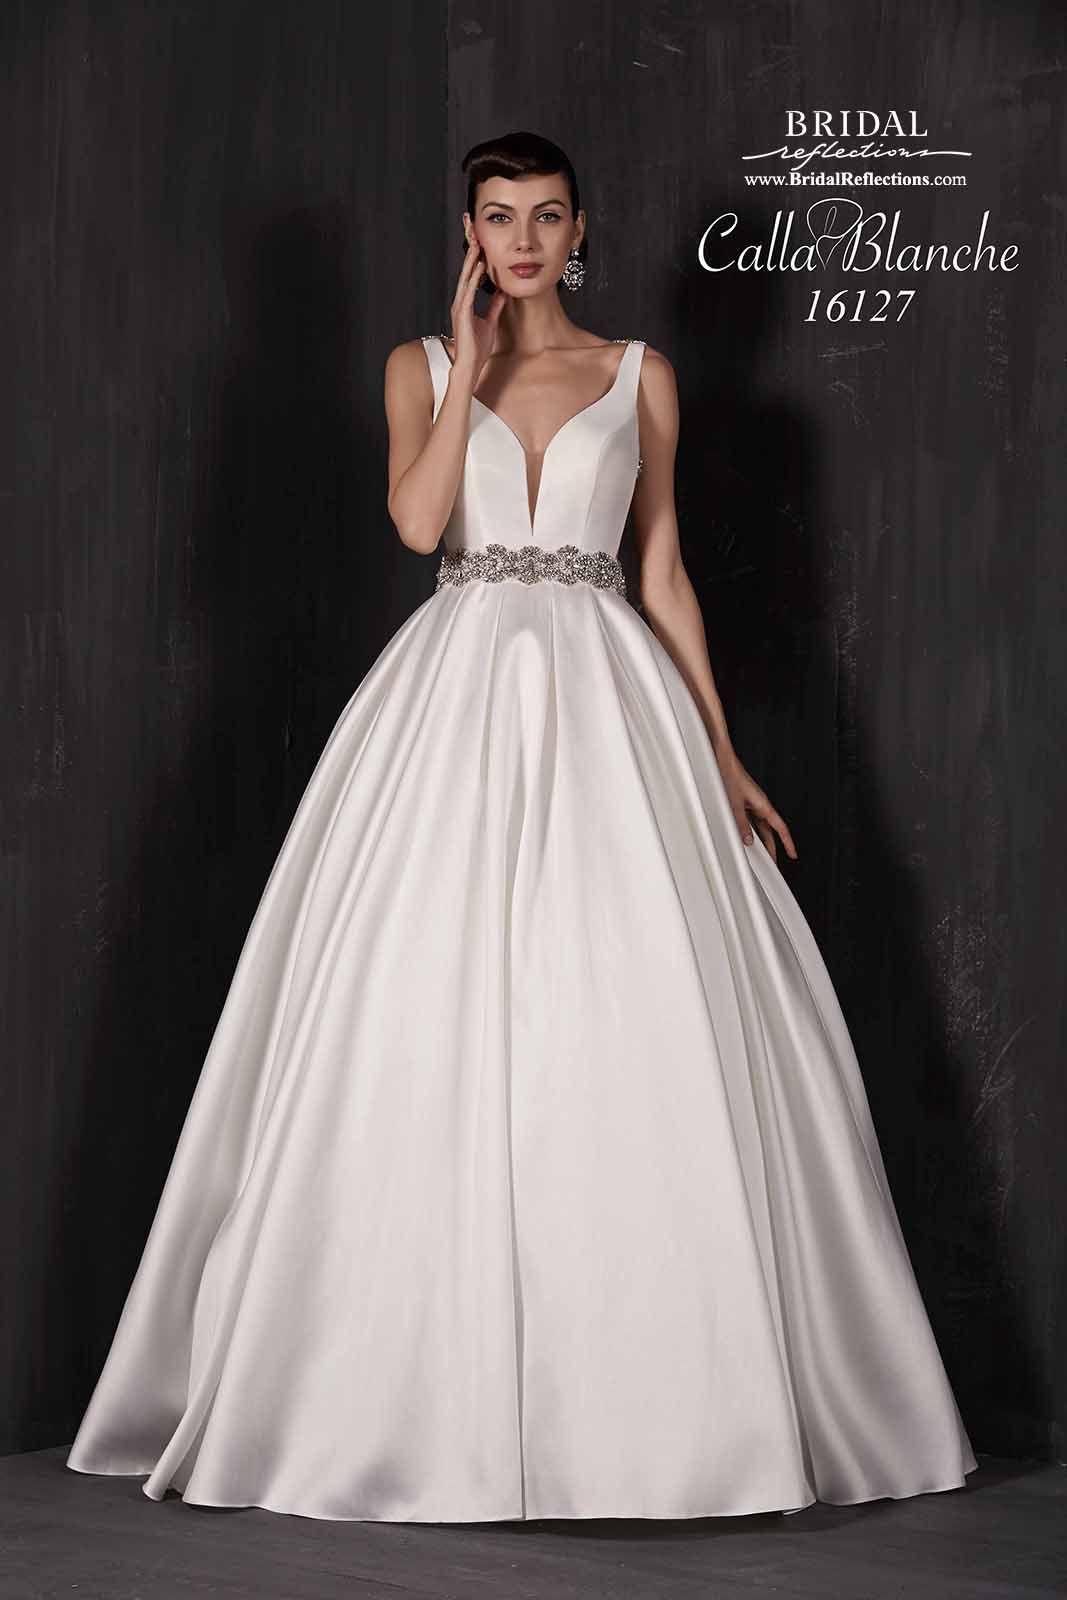 Traditional tunisian wedding dress  Calla Blanche Wedding Dress Collection  Bridal Reflections